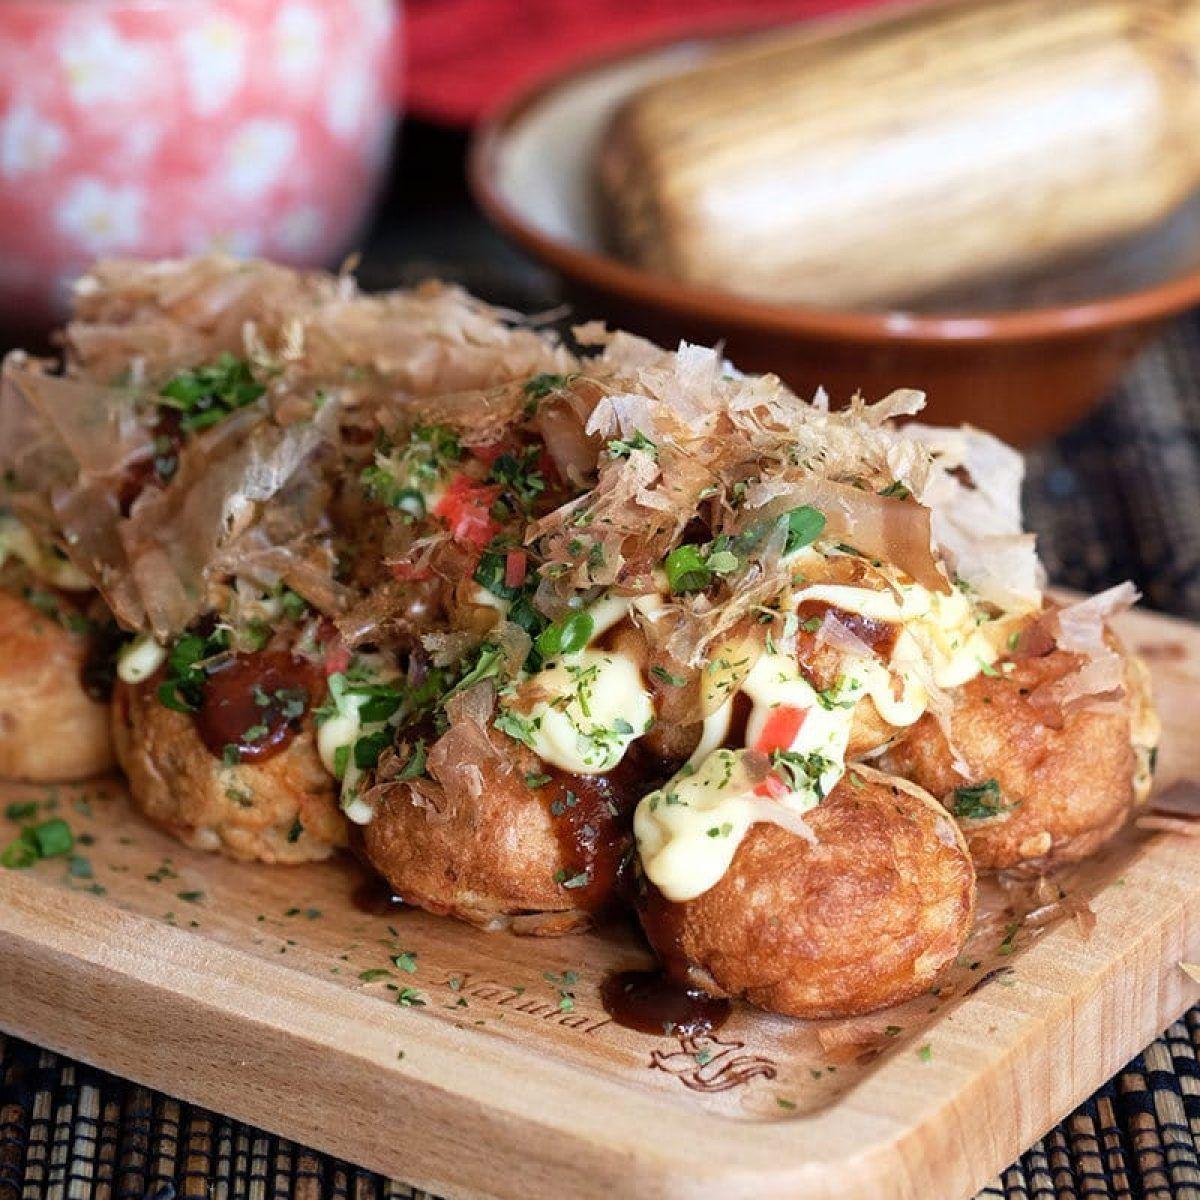 ThaiStyle Crispy Pork Belly Recipe Crispy pork belly